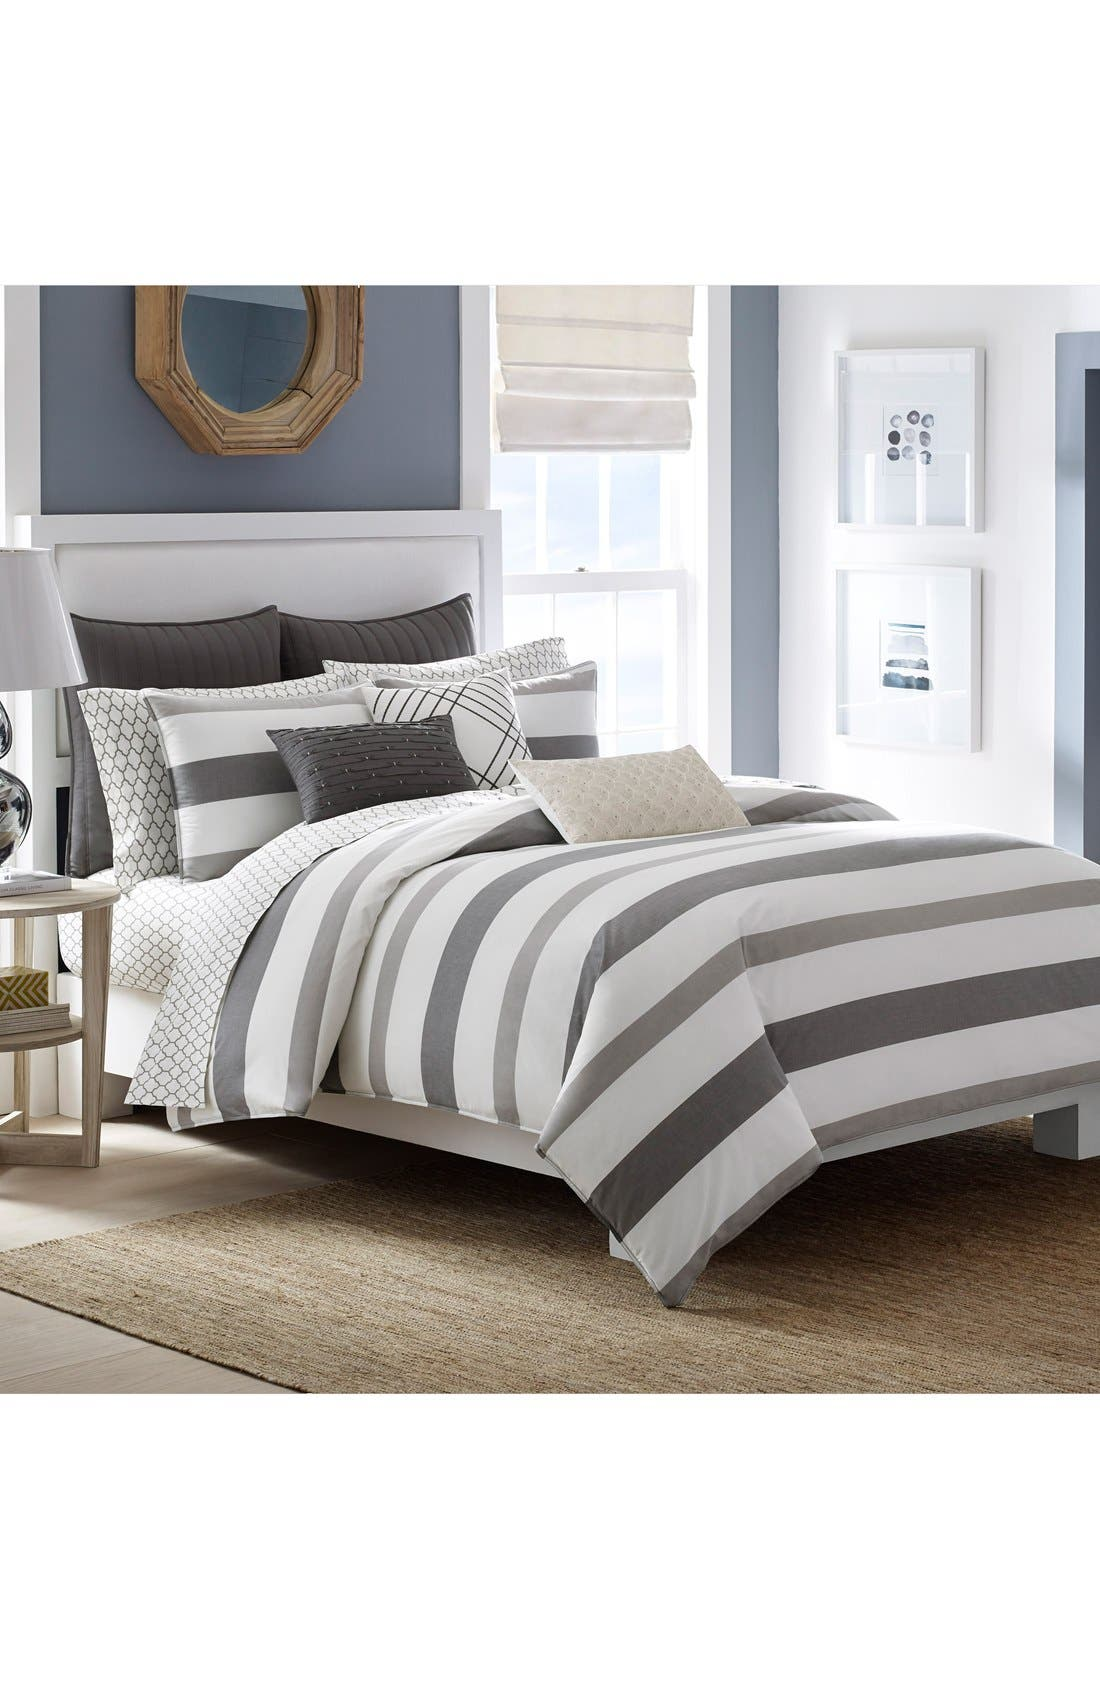 Alternate Image 1 Selected - Nautica Chatfield Comforter & Sham Set